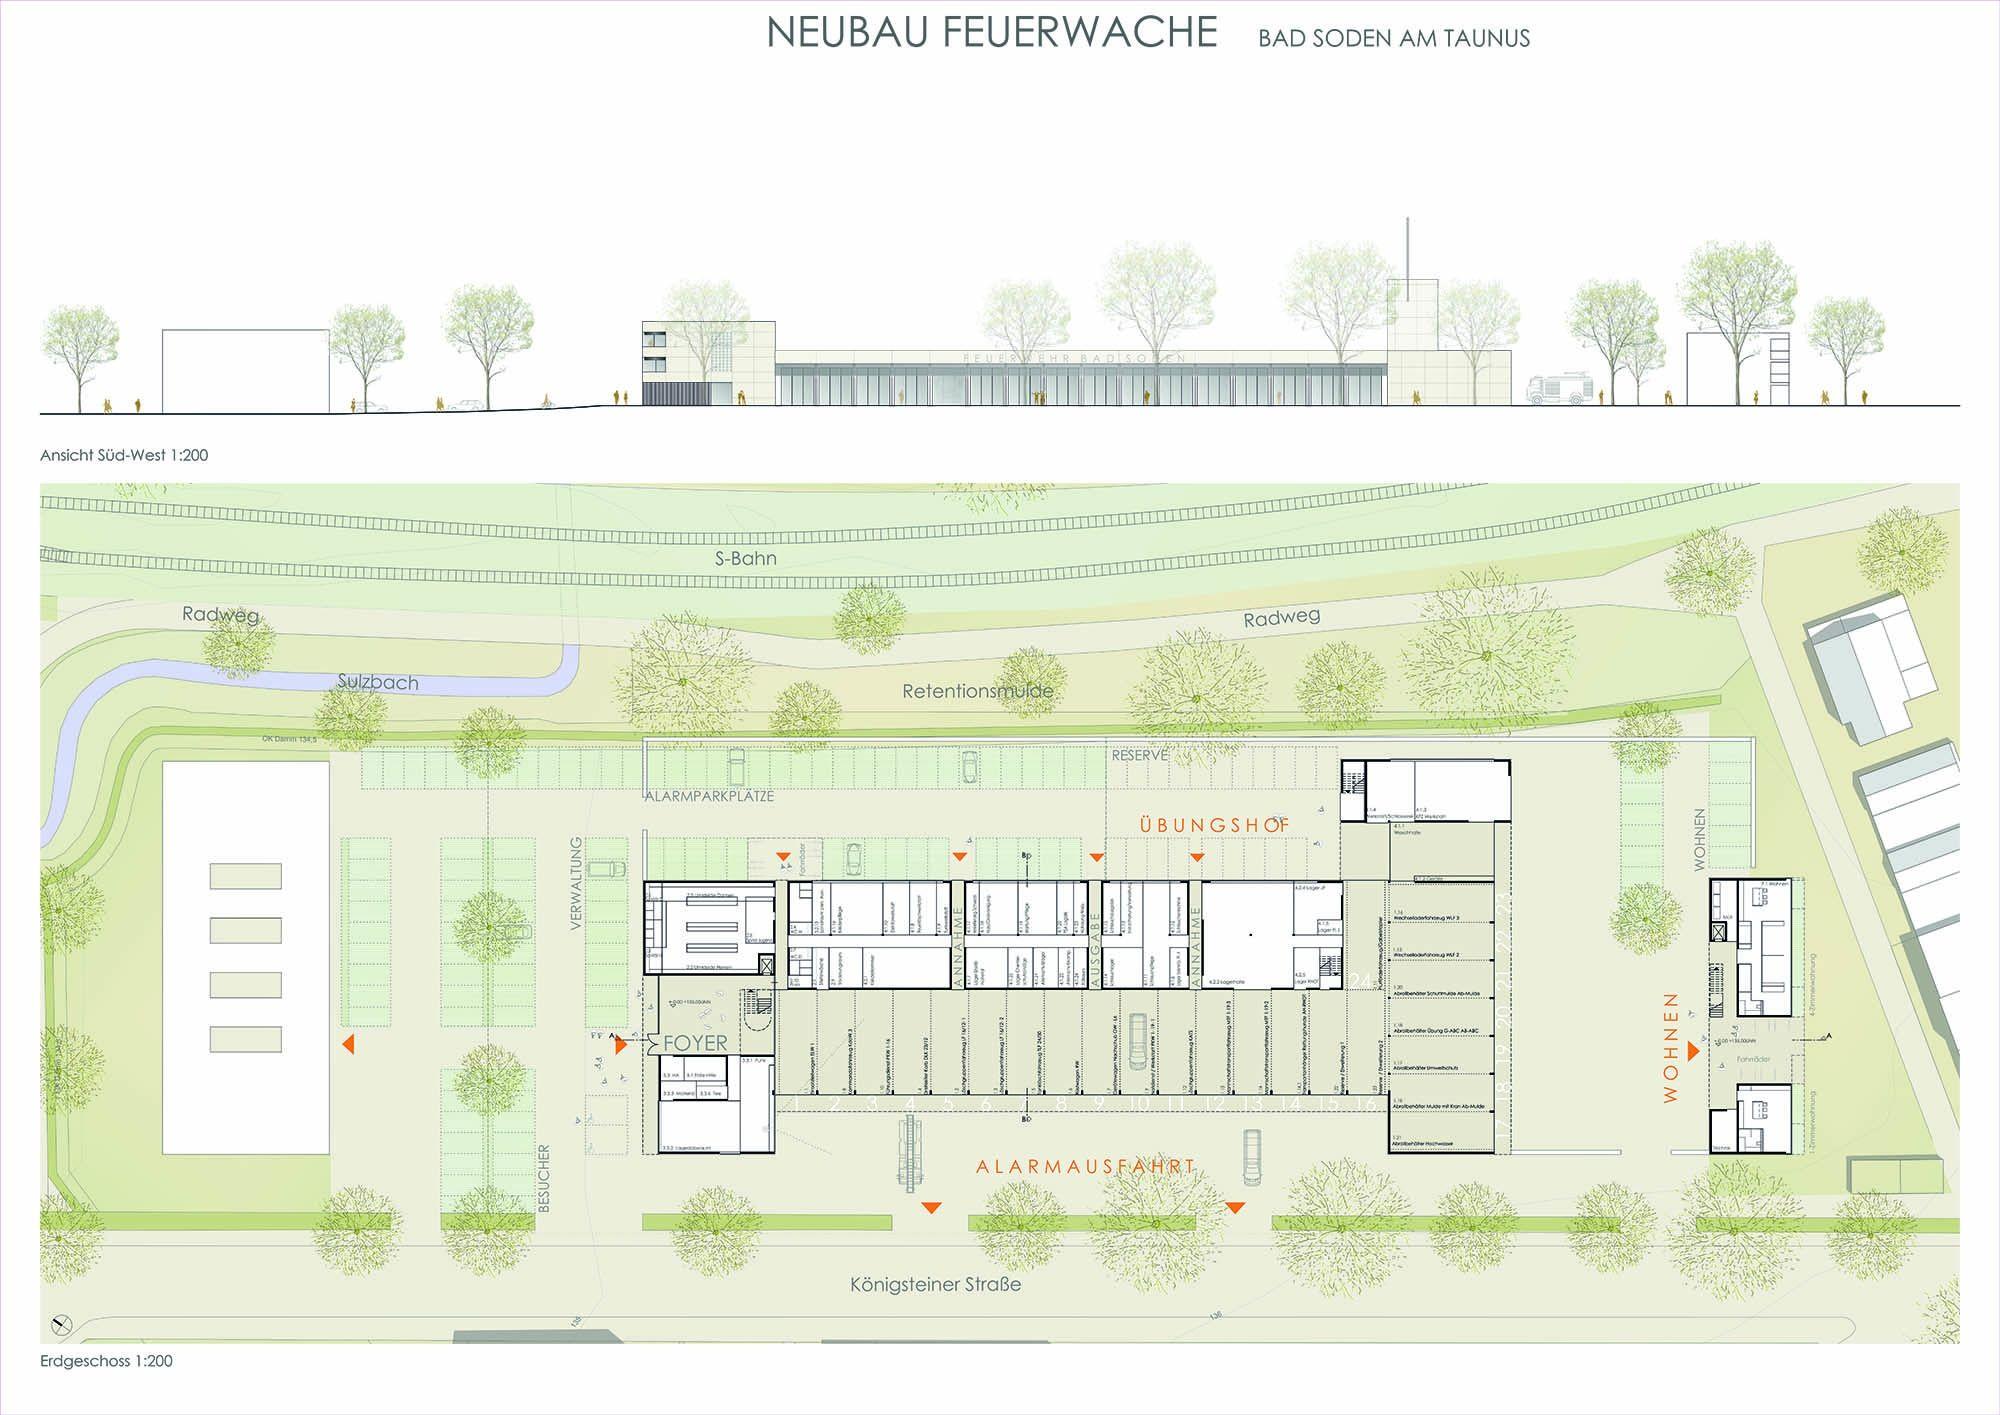 Neubau Feuerwache Bad Soden am Taunus 1. Preis